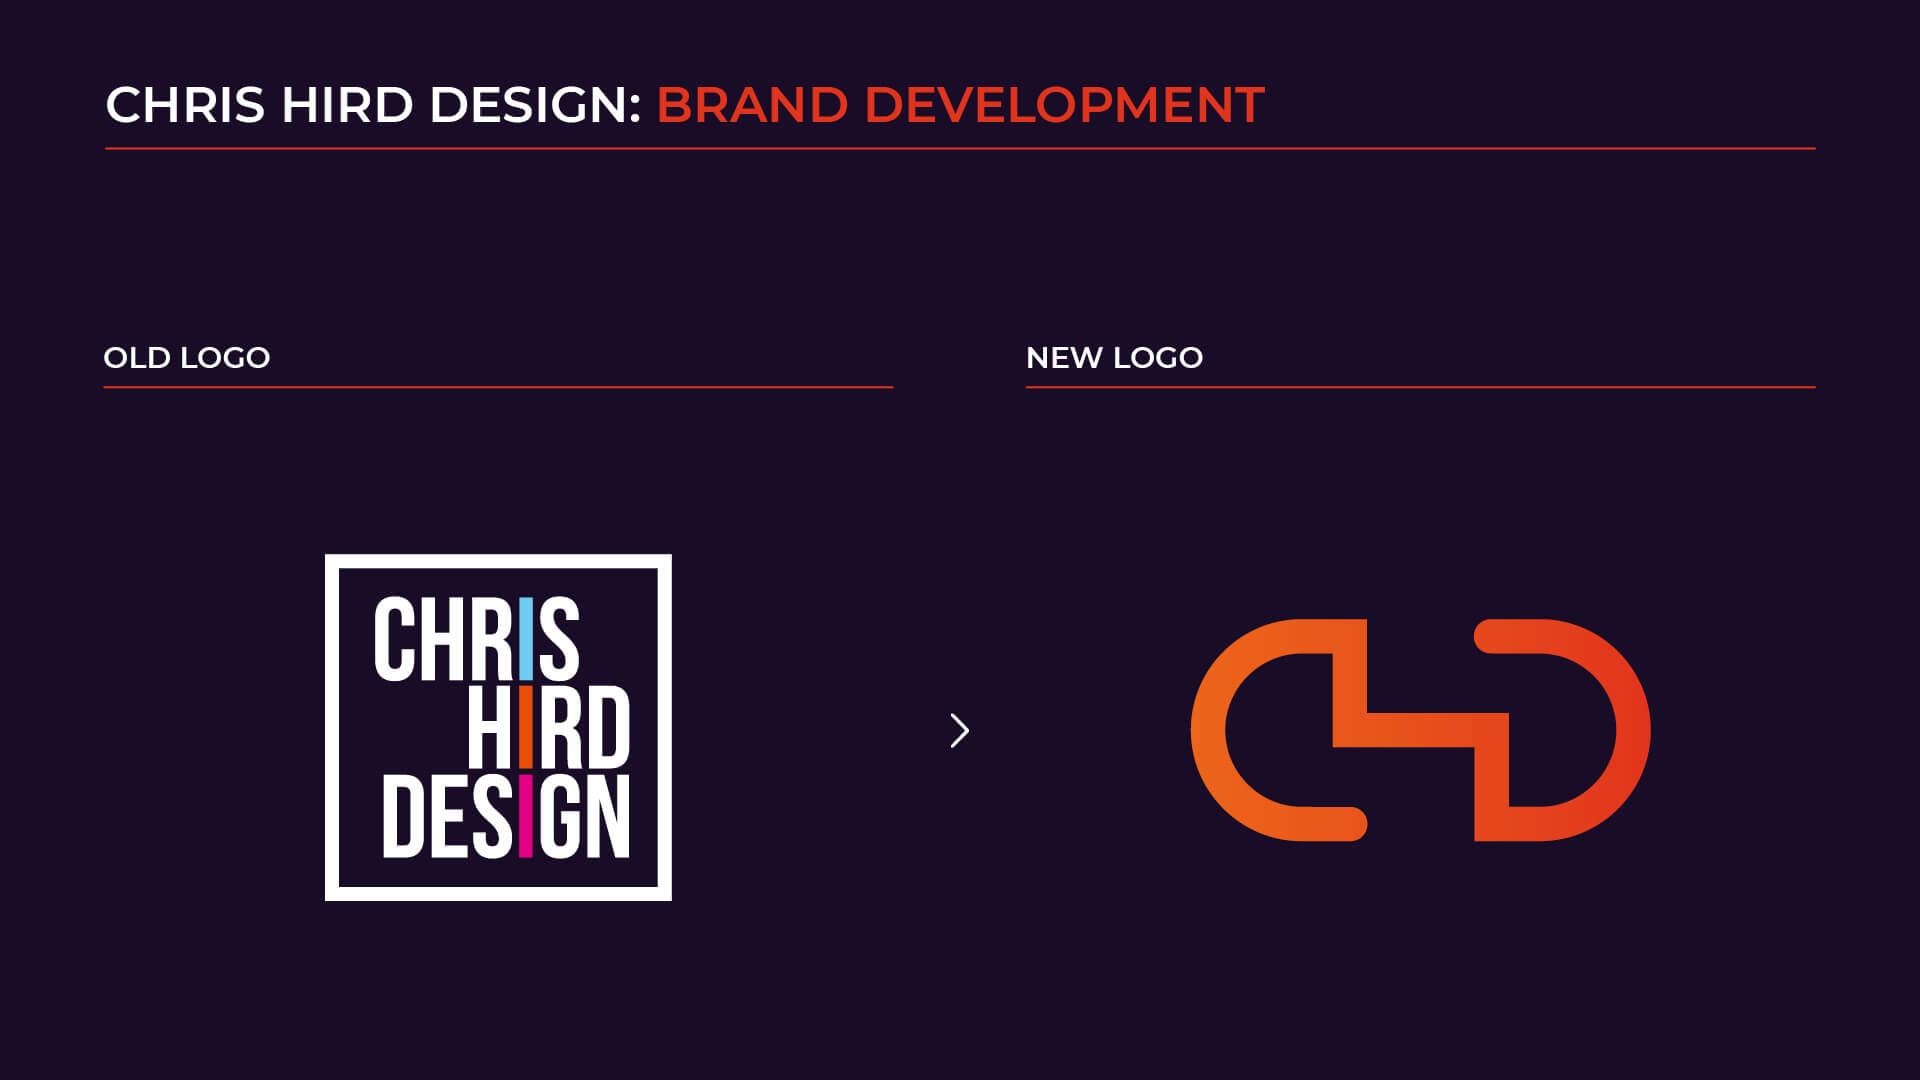 Old & New logos